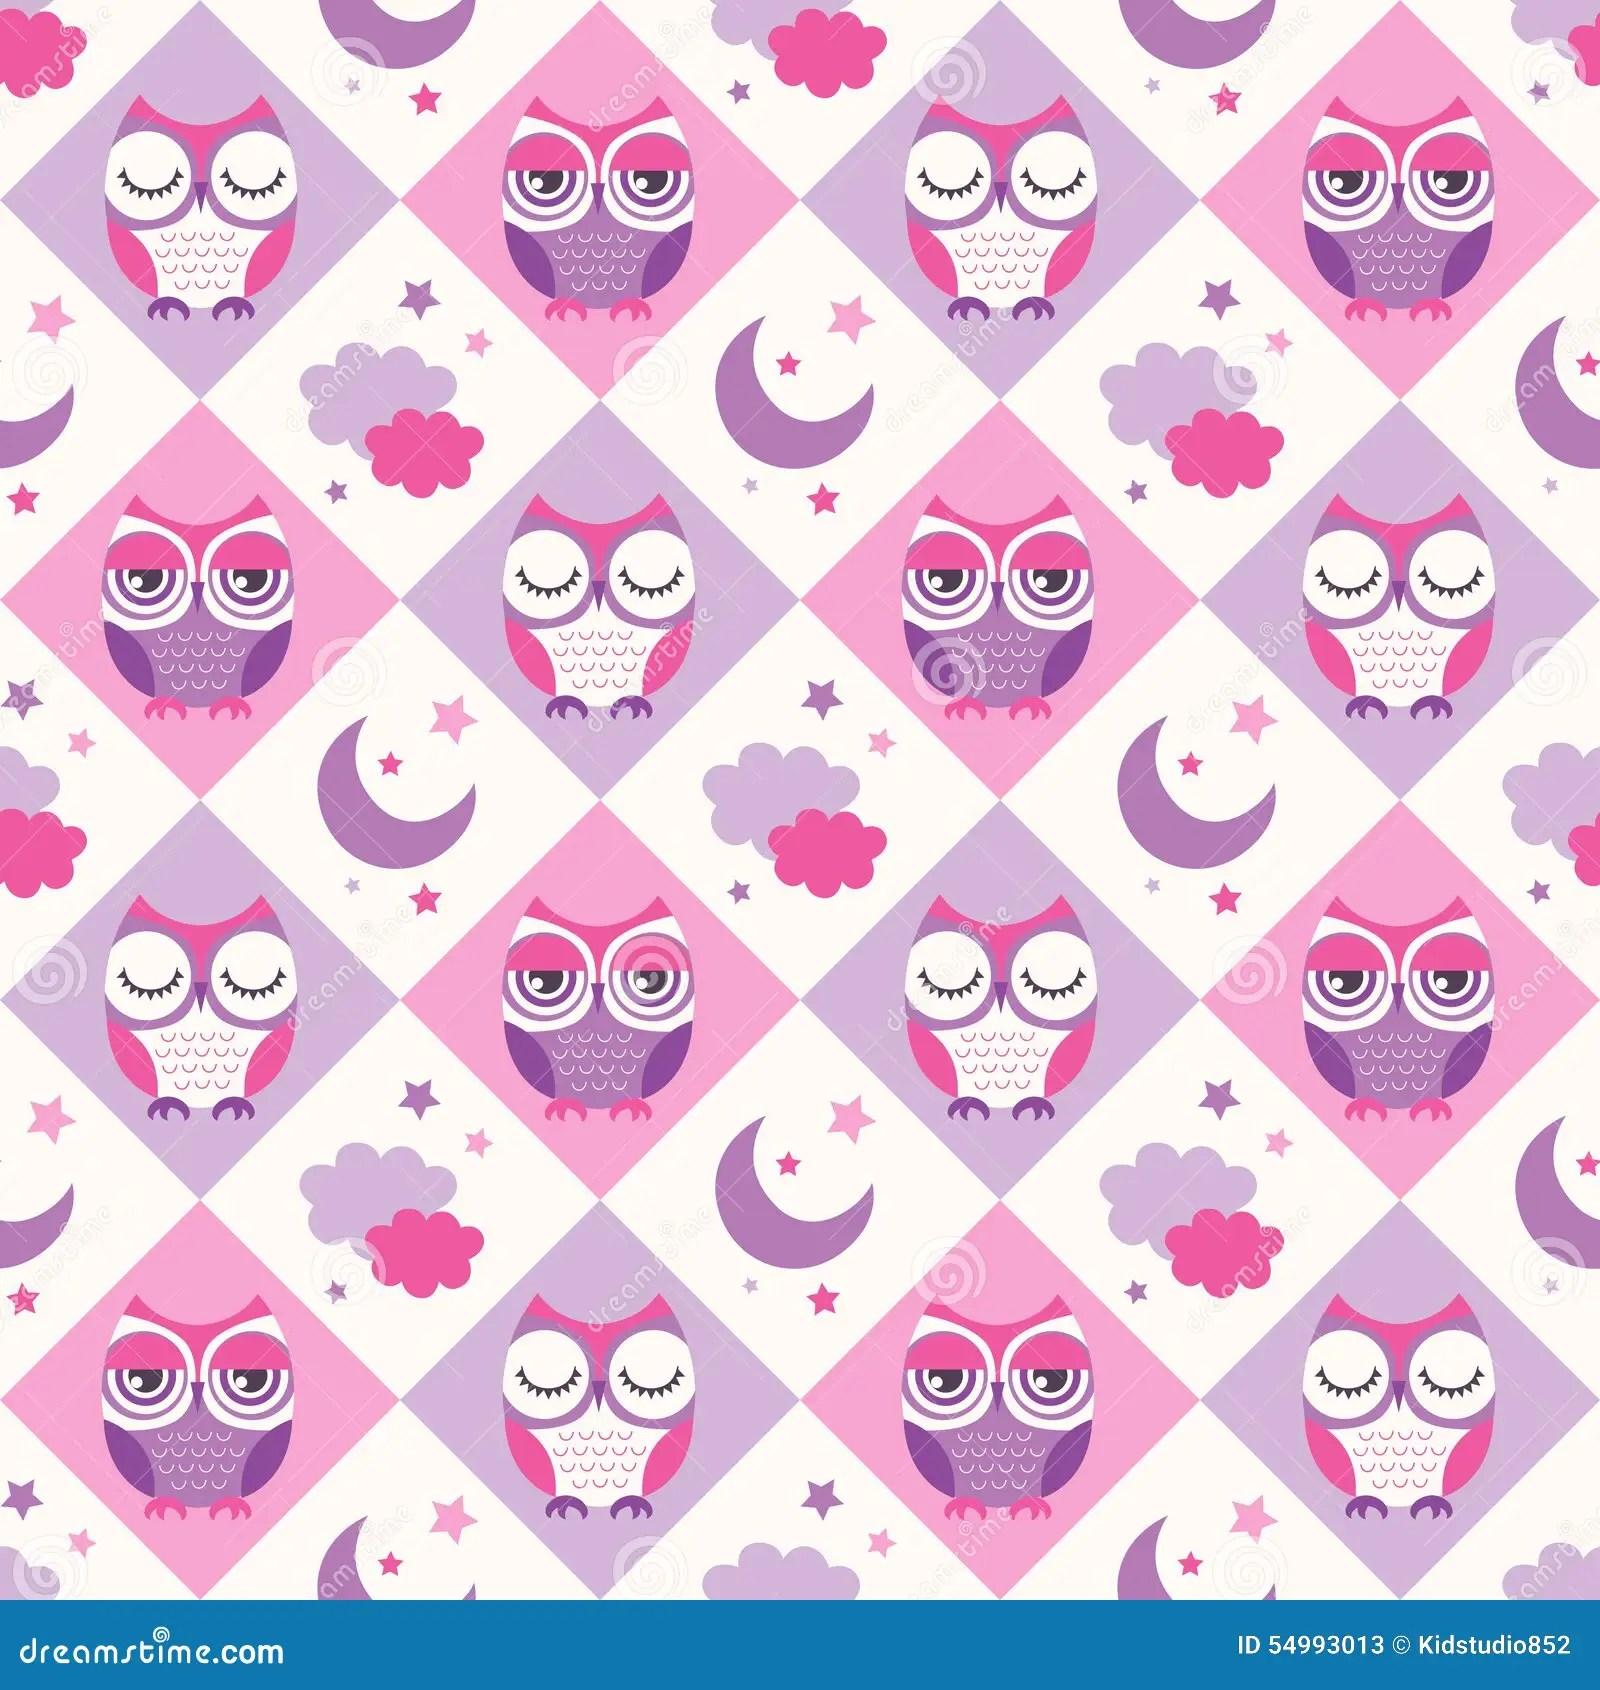 Cute Cartoon Animal Wallpaper Seamless Owls Birds Bedroom Background Stock Vector